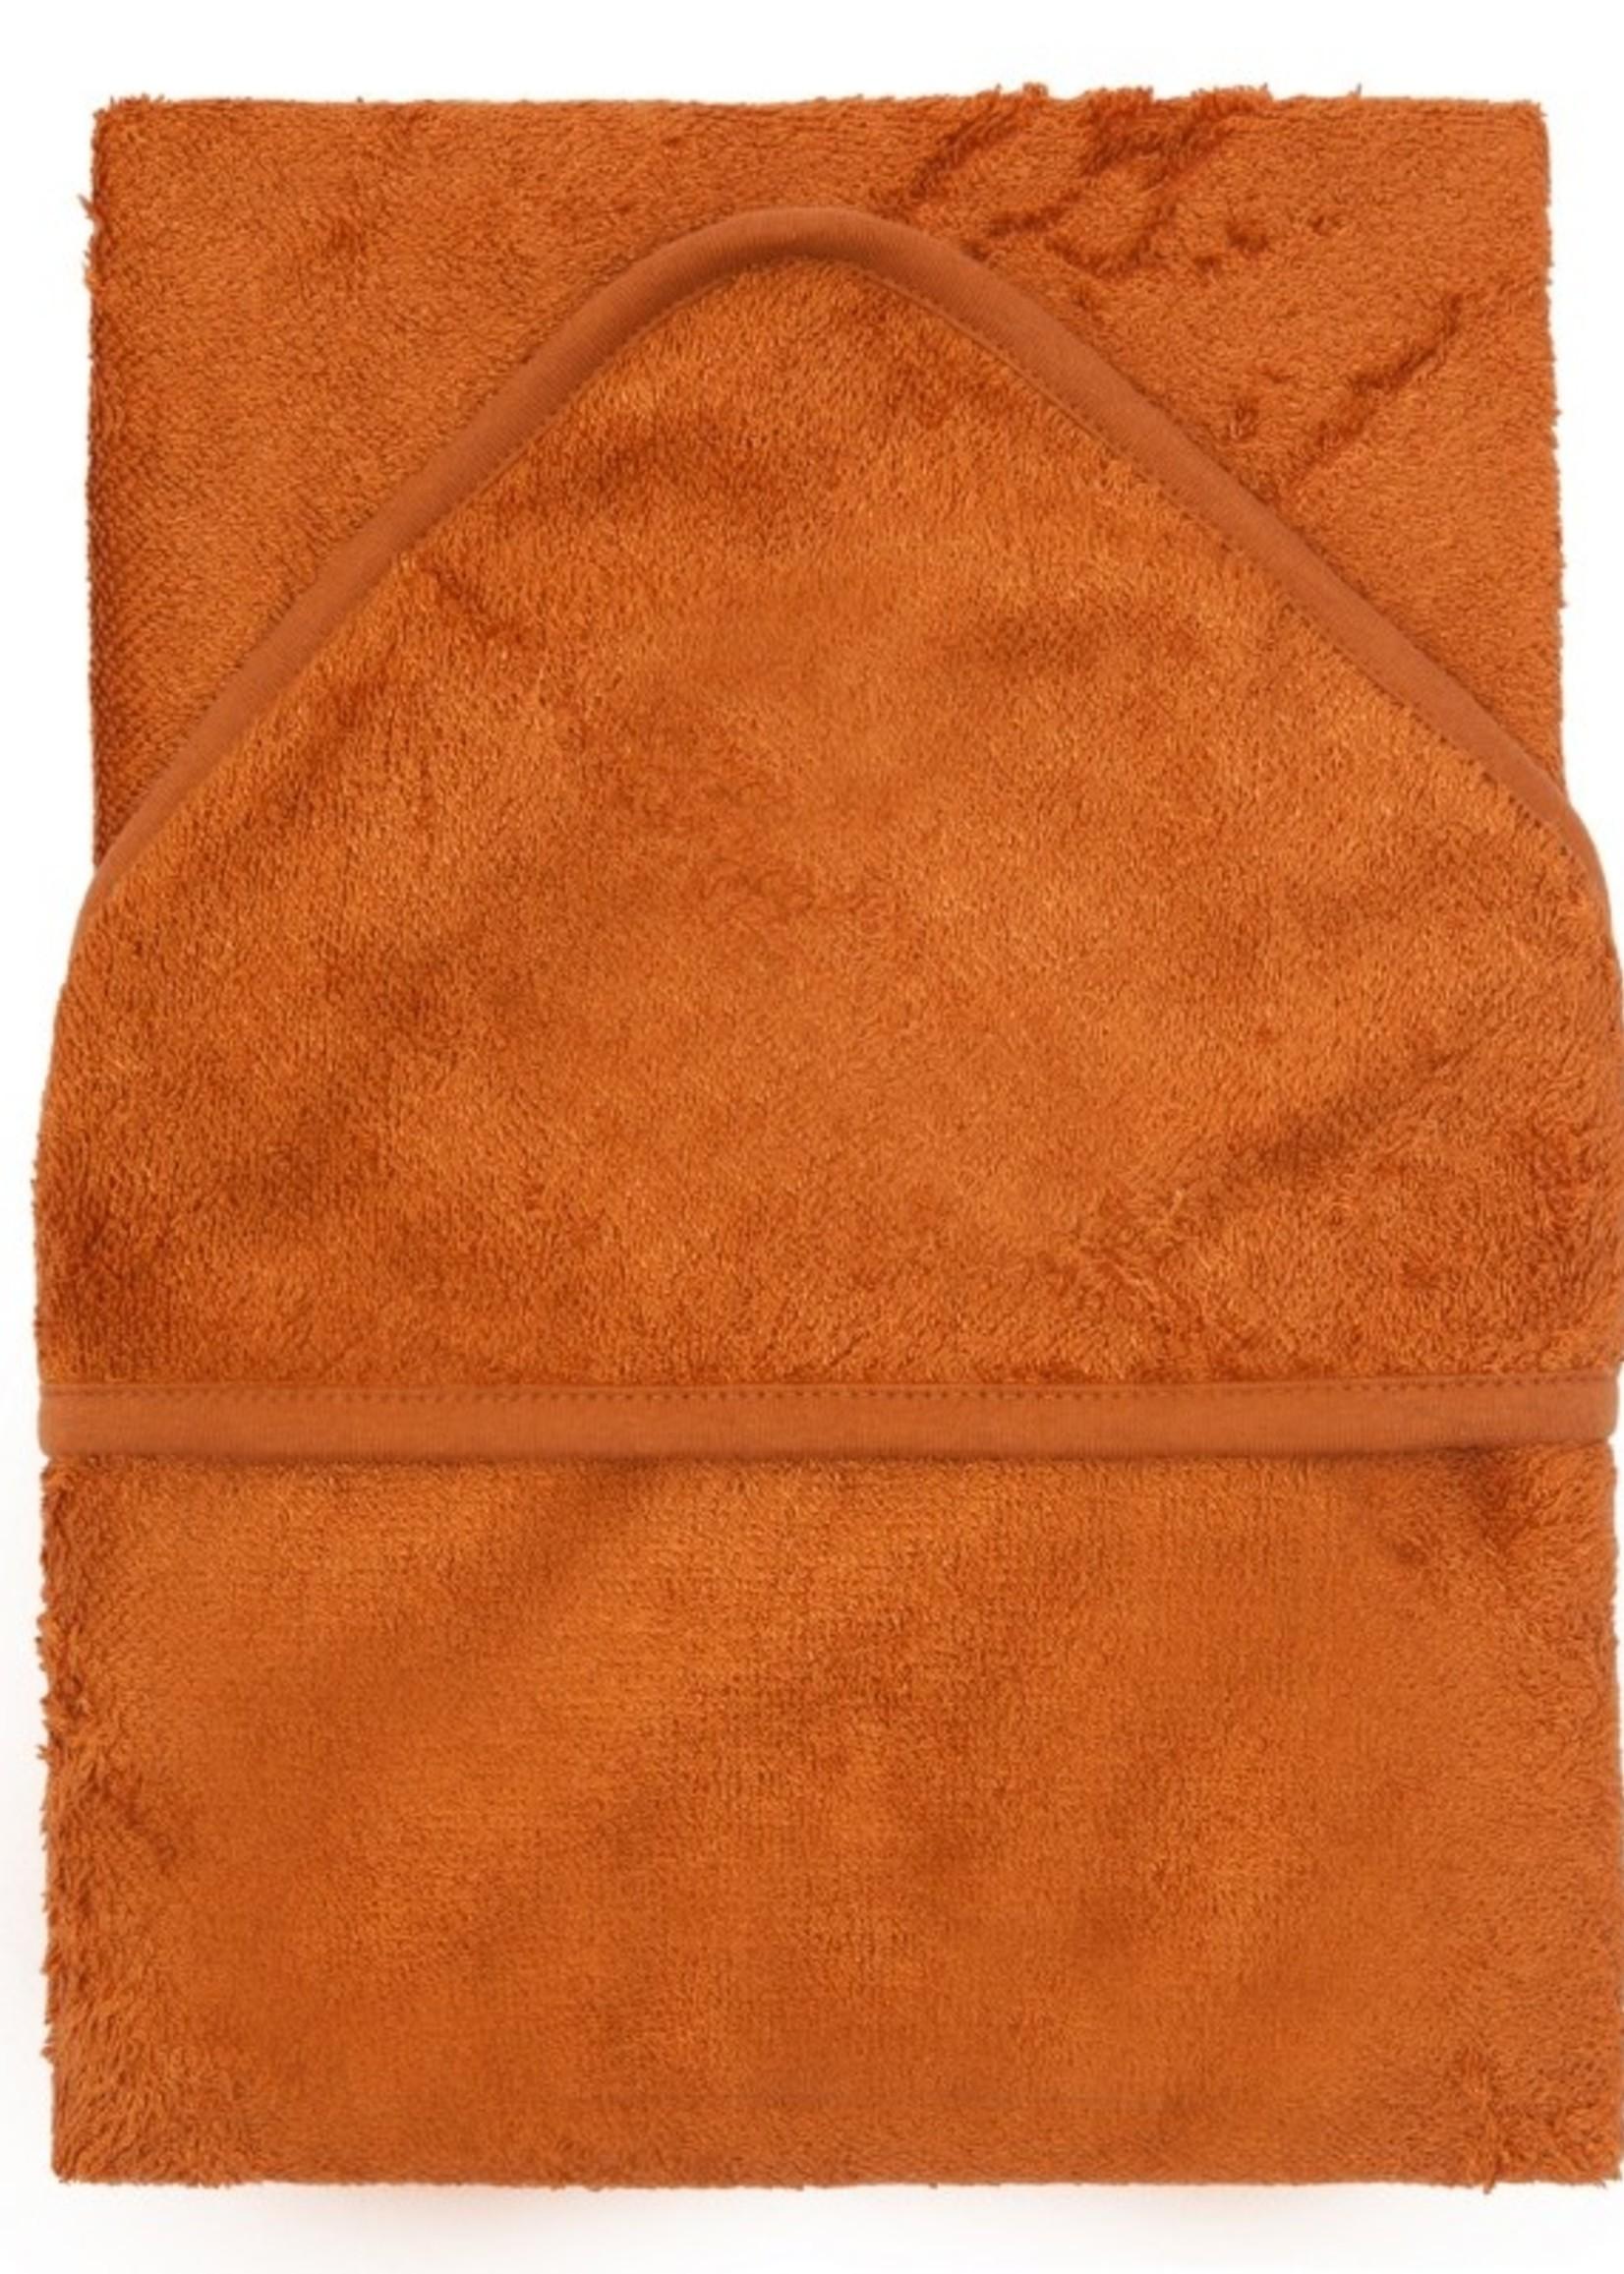 Timboo Hooded towel XL - Inca Rust